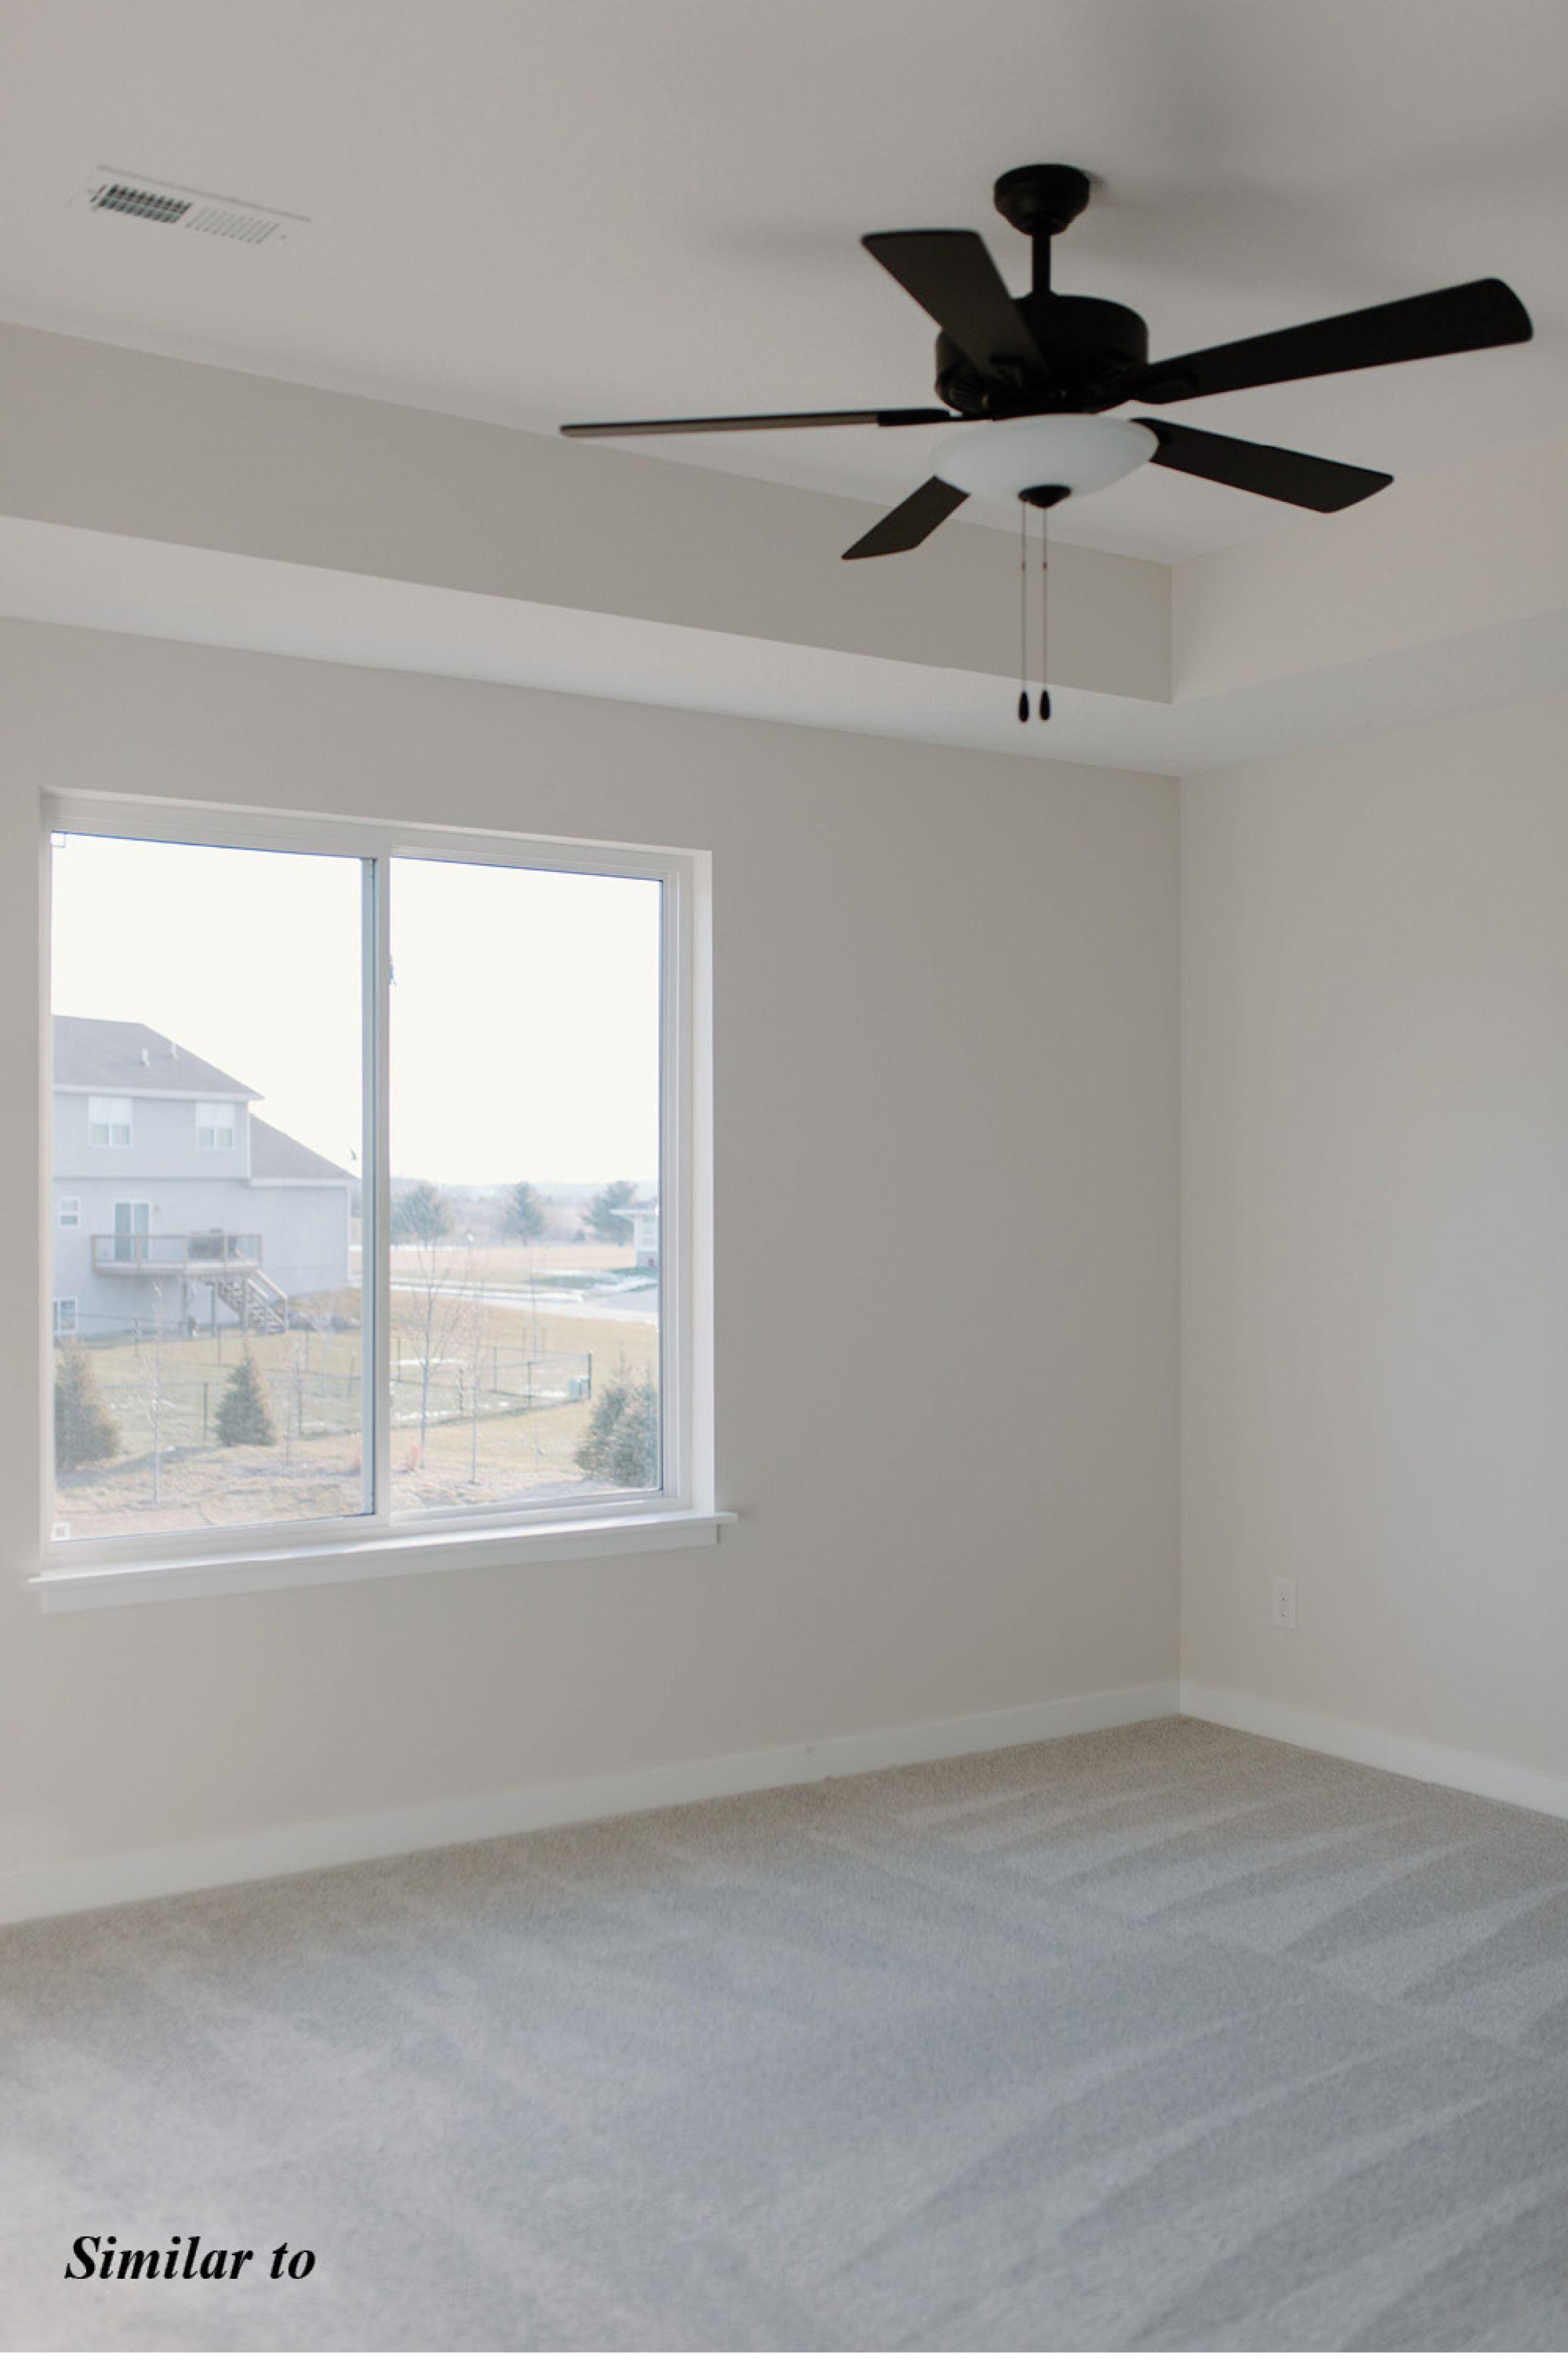 residential-warren-county-iowa-0-acres-listing-number-15675-10-2021-08-06-141920.jpg